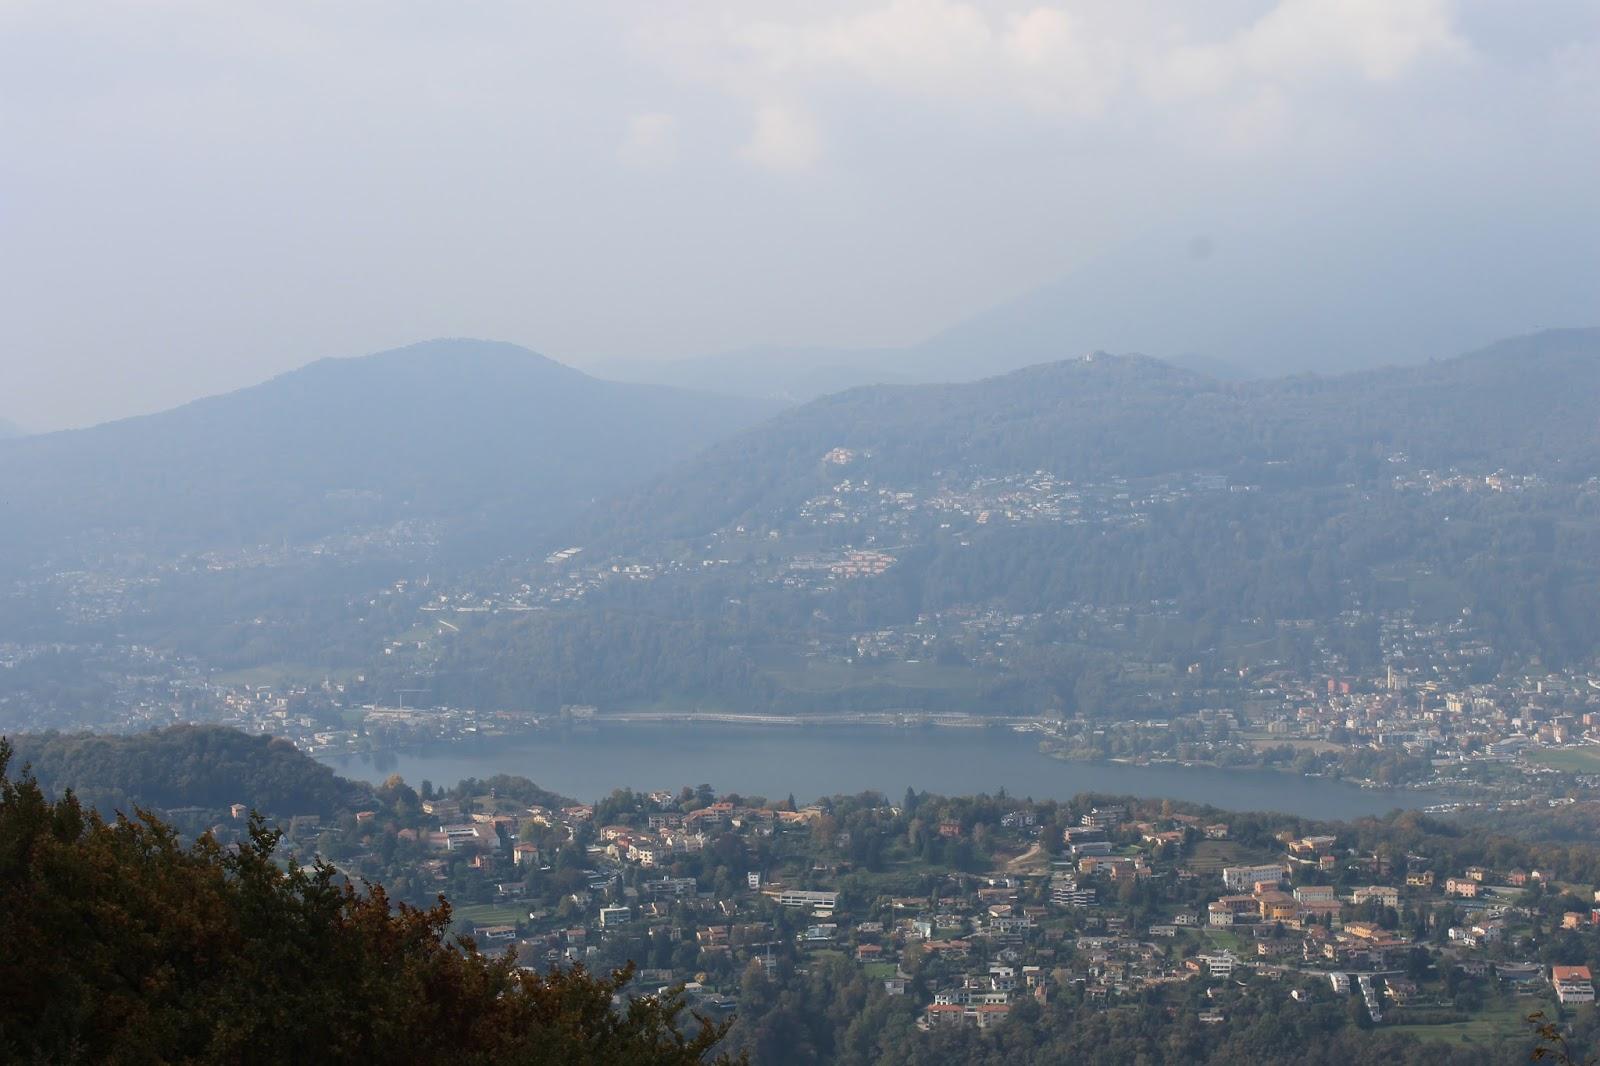 Vista do Monte San Salvatore - Lugano